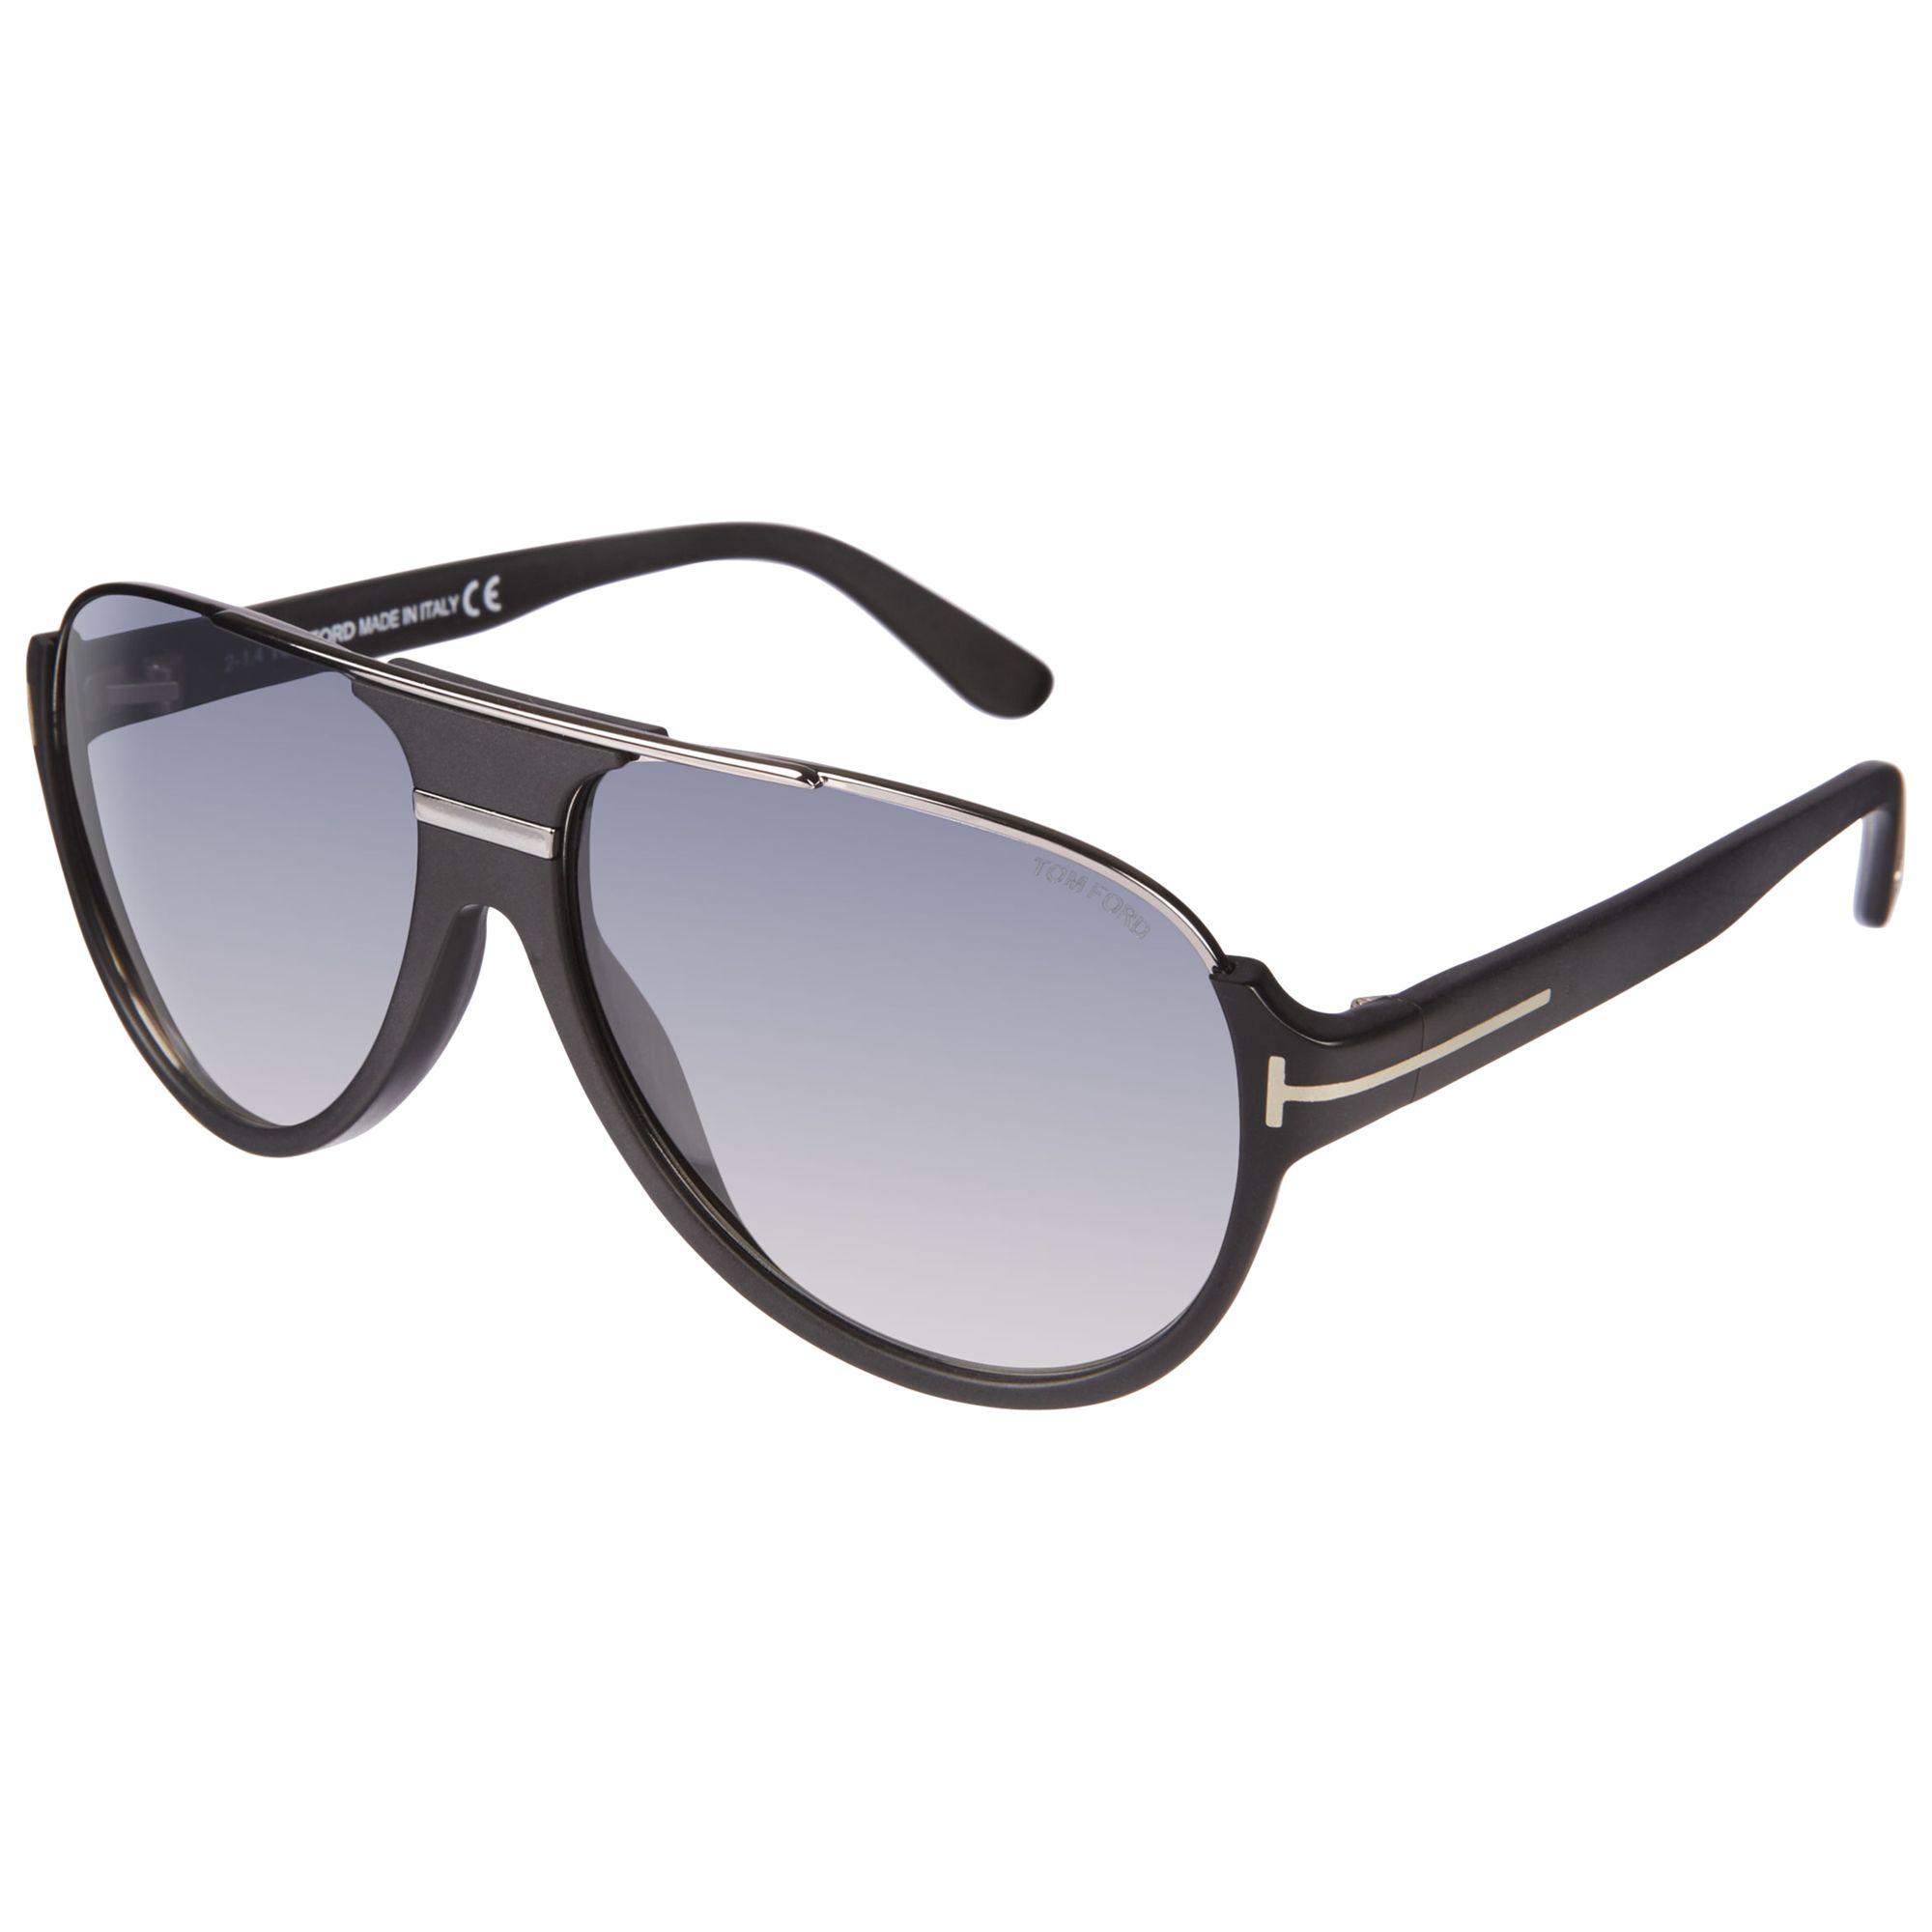 ece2cf24ba Black At Ft0334 Lewis Partners Ford Tom Dimitry Sunglasses amp  John qZ75PI